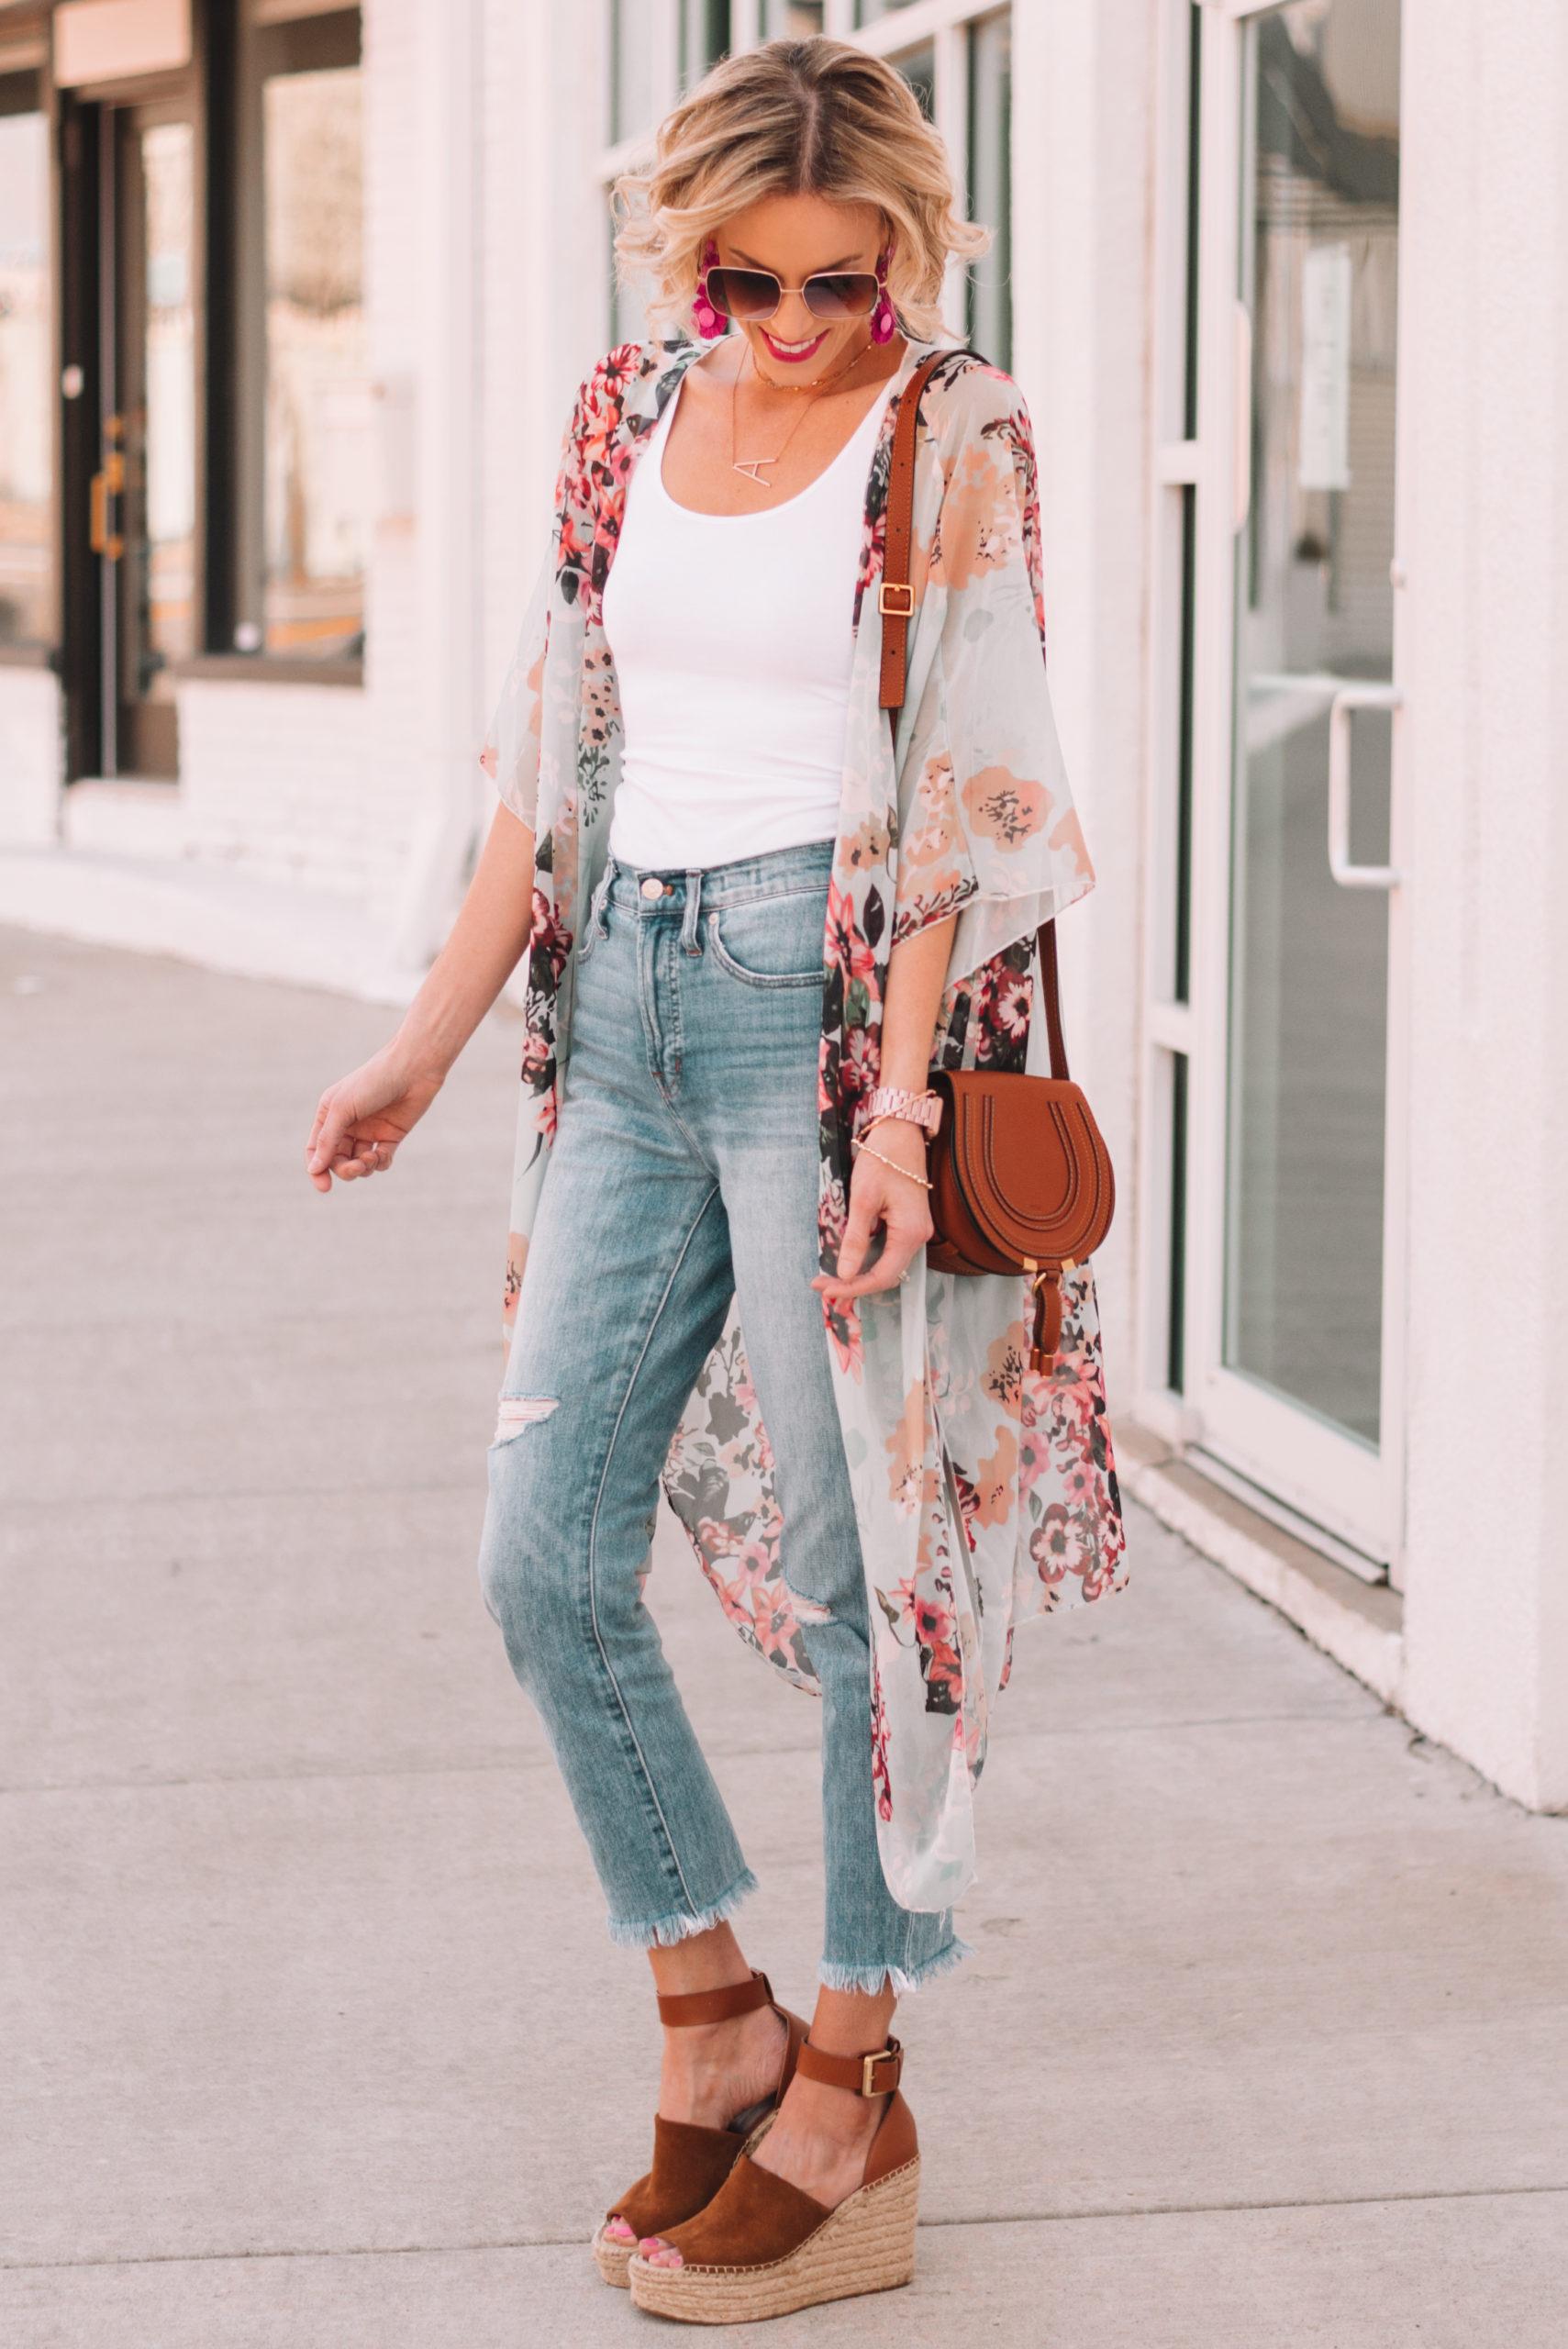 Kick Flare Jeans with Tank or Kimono Top